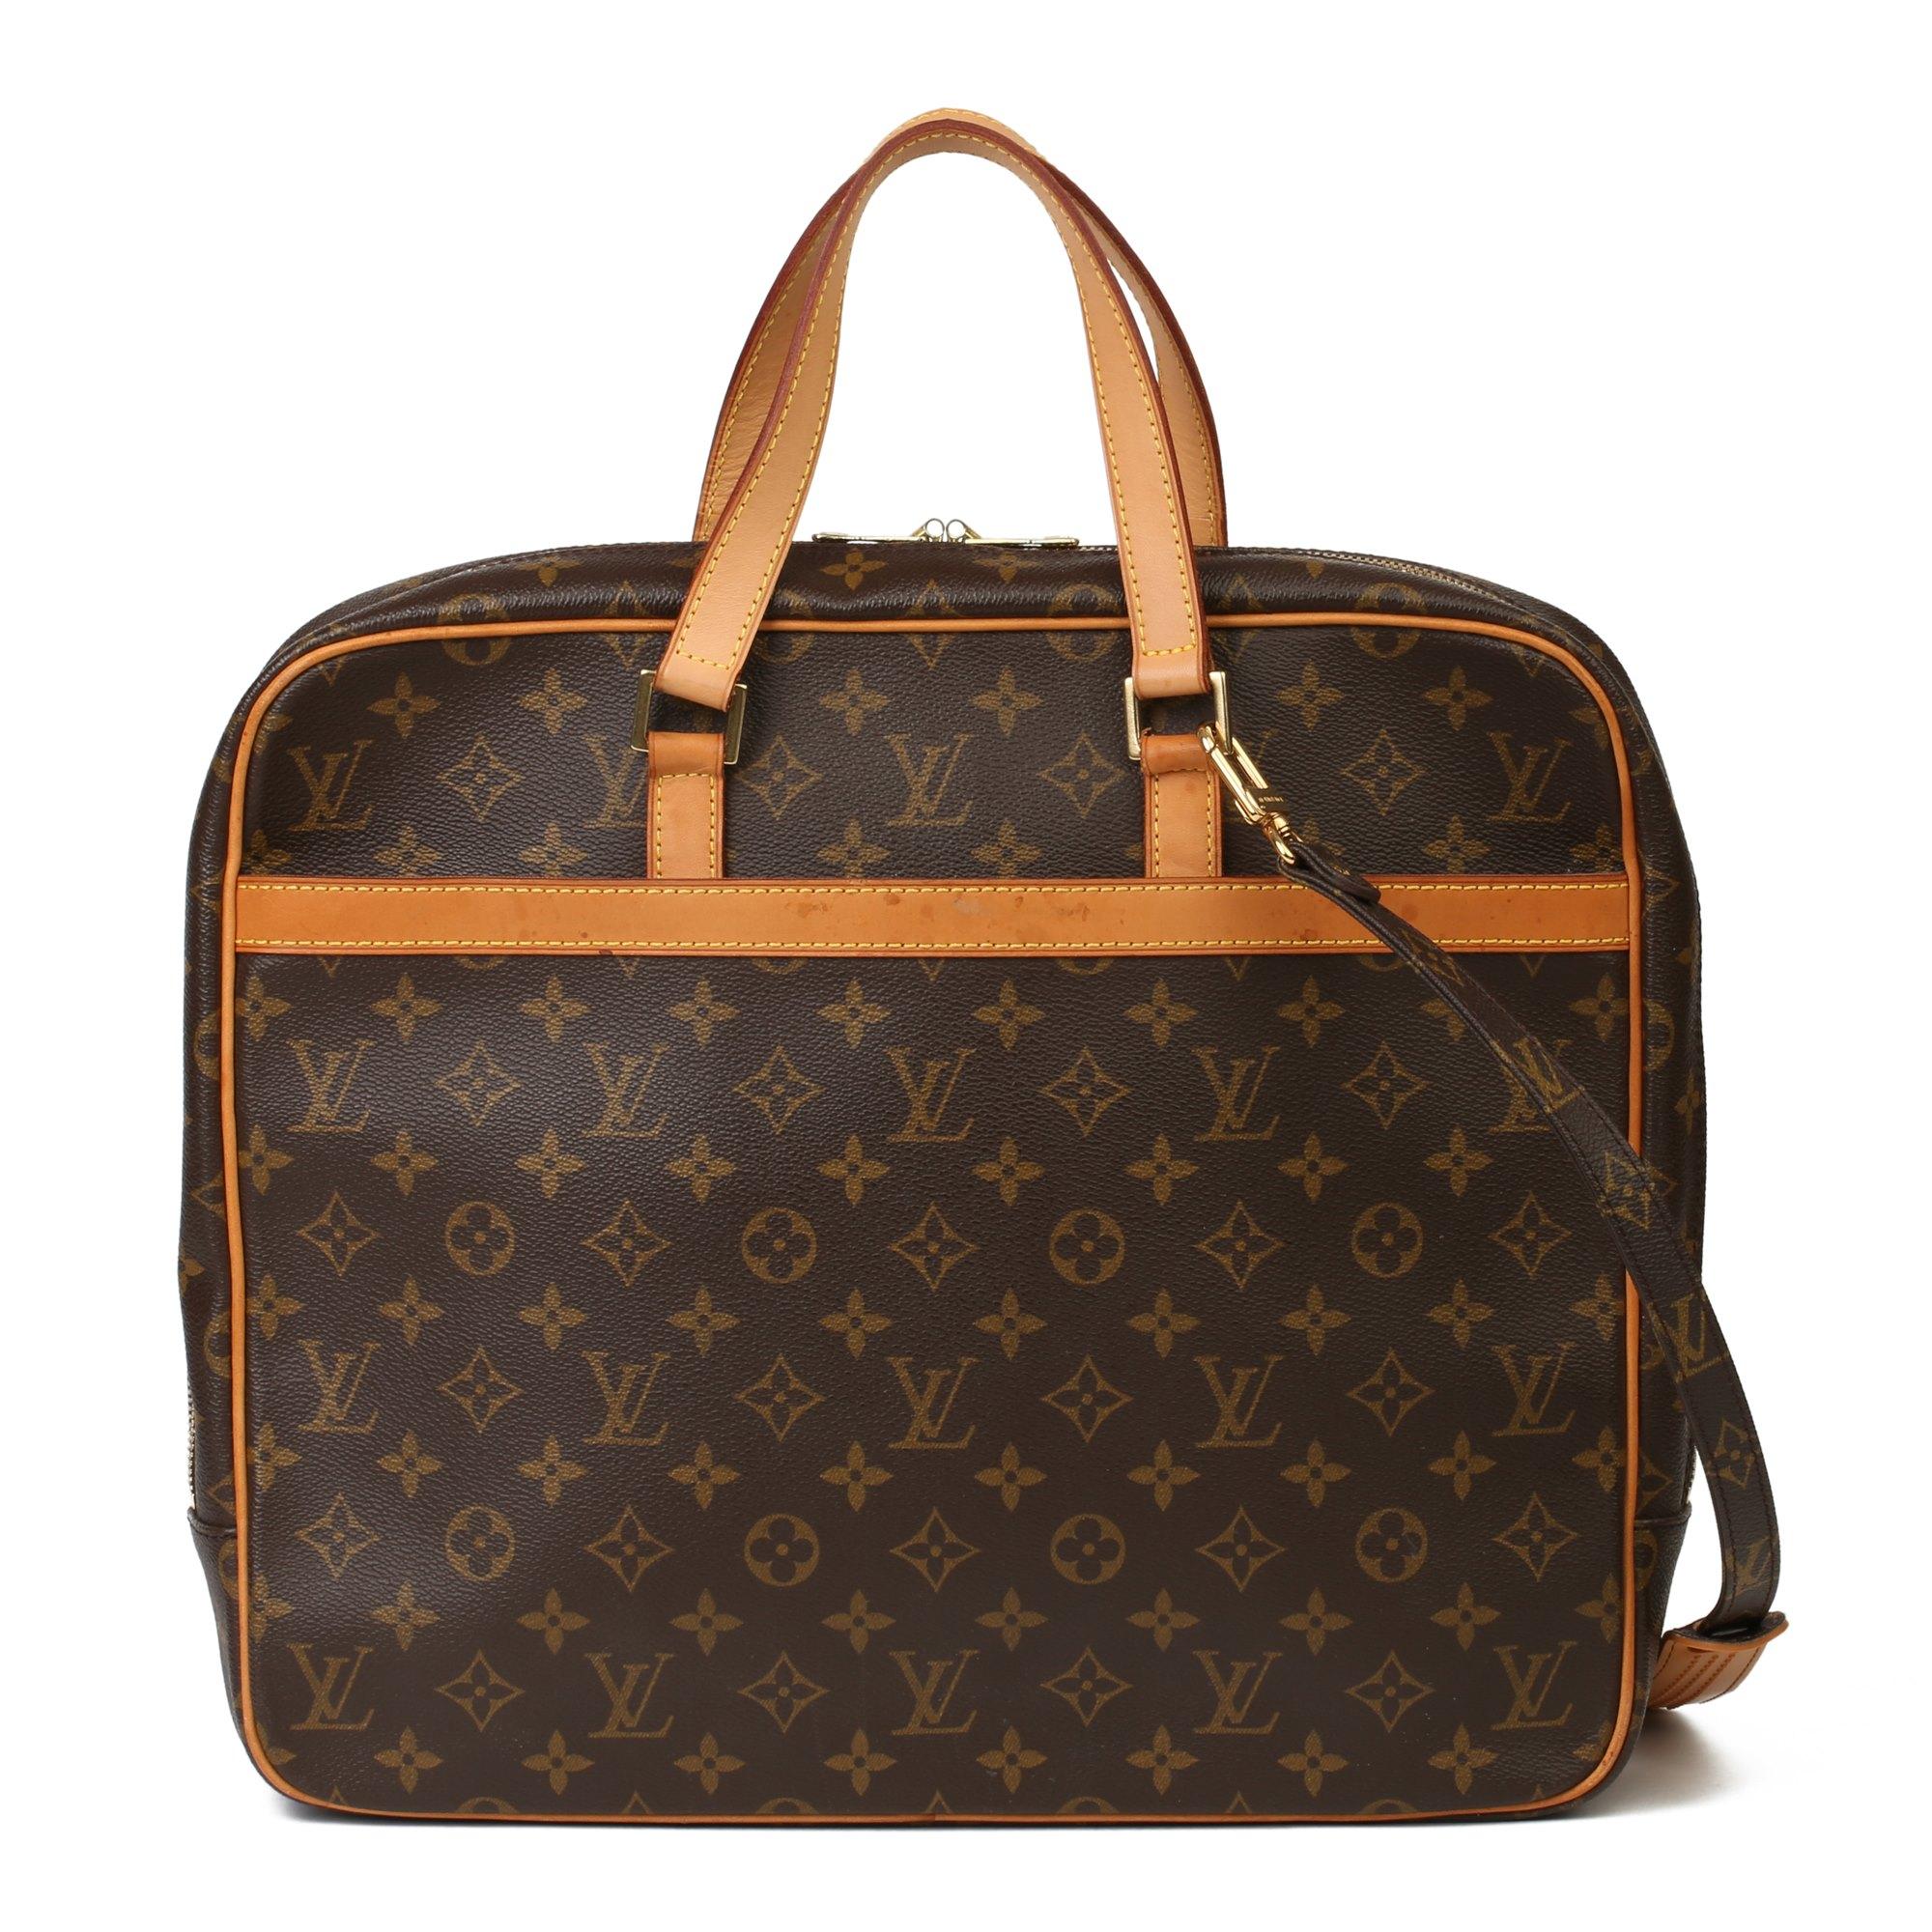 Louis Vuitton Brown Monogram Coated Canvas & Vachetta Leather Porte-Documents Pegase Briefcase